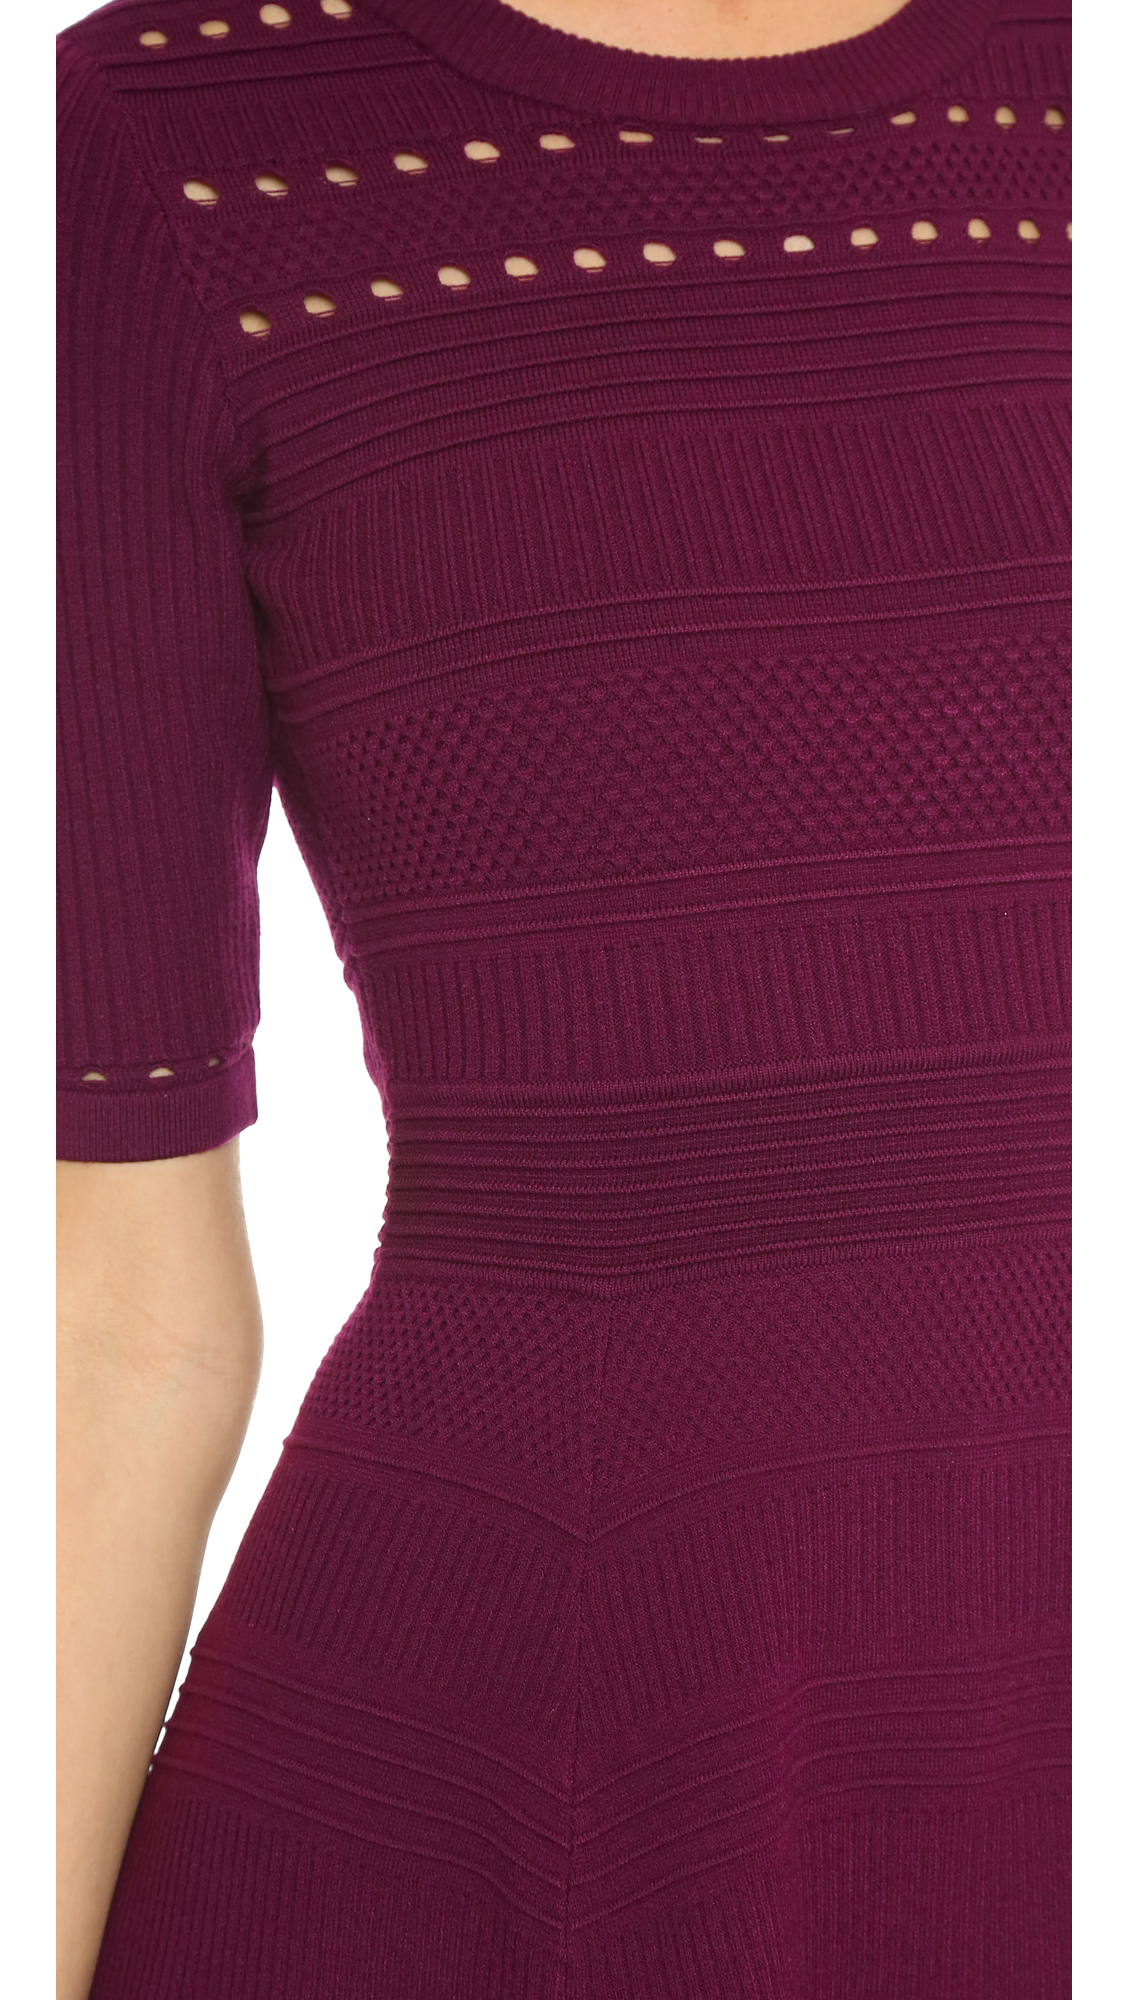 Lyst Milly Textured Stitch Flare Dress Burgundy In Purple